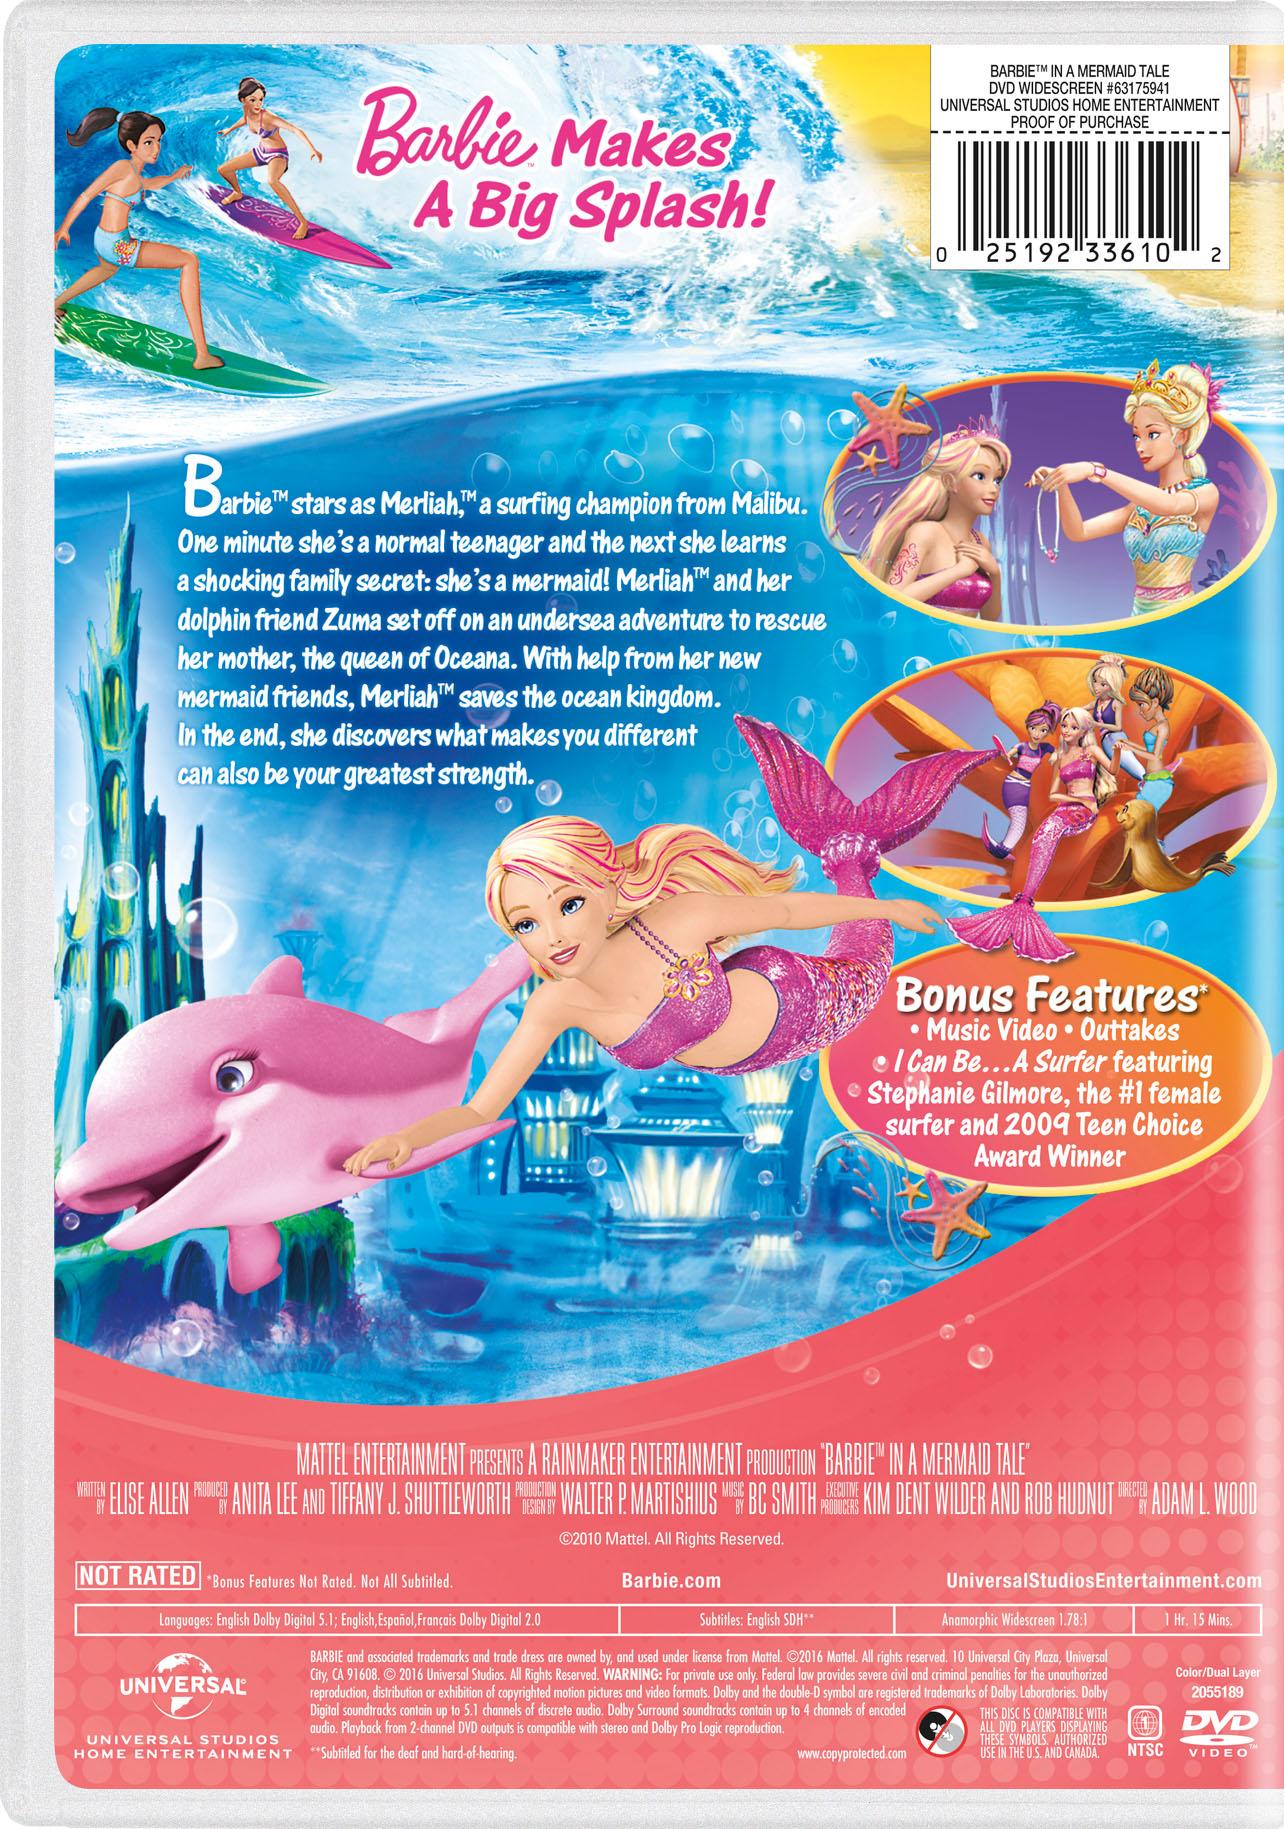 barbie in a mermaid tale movie page dvd blu ray digital hd on